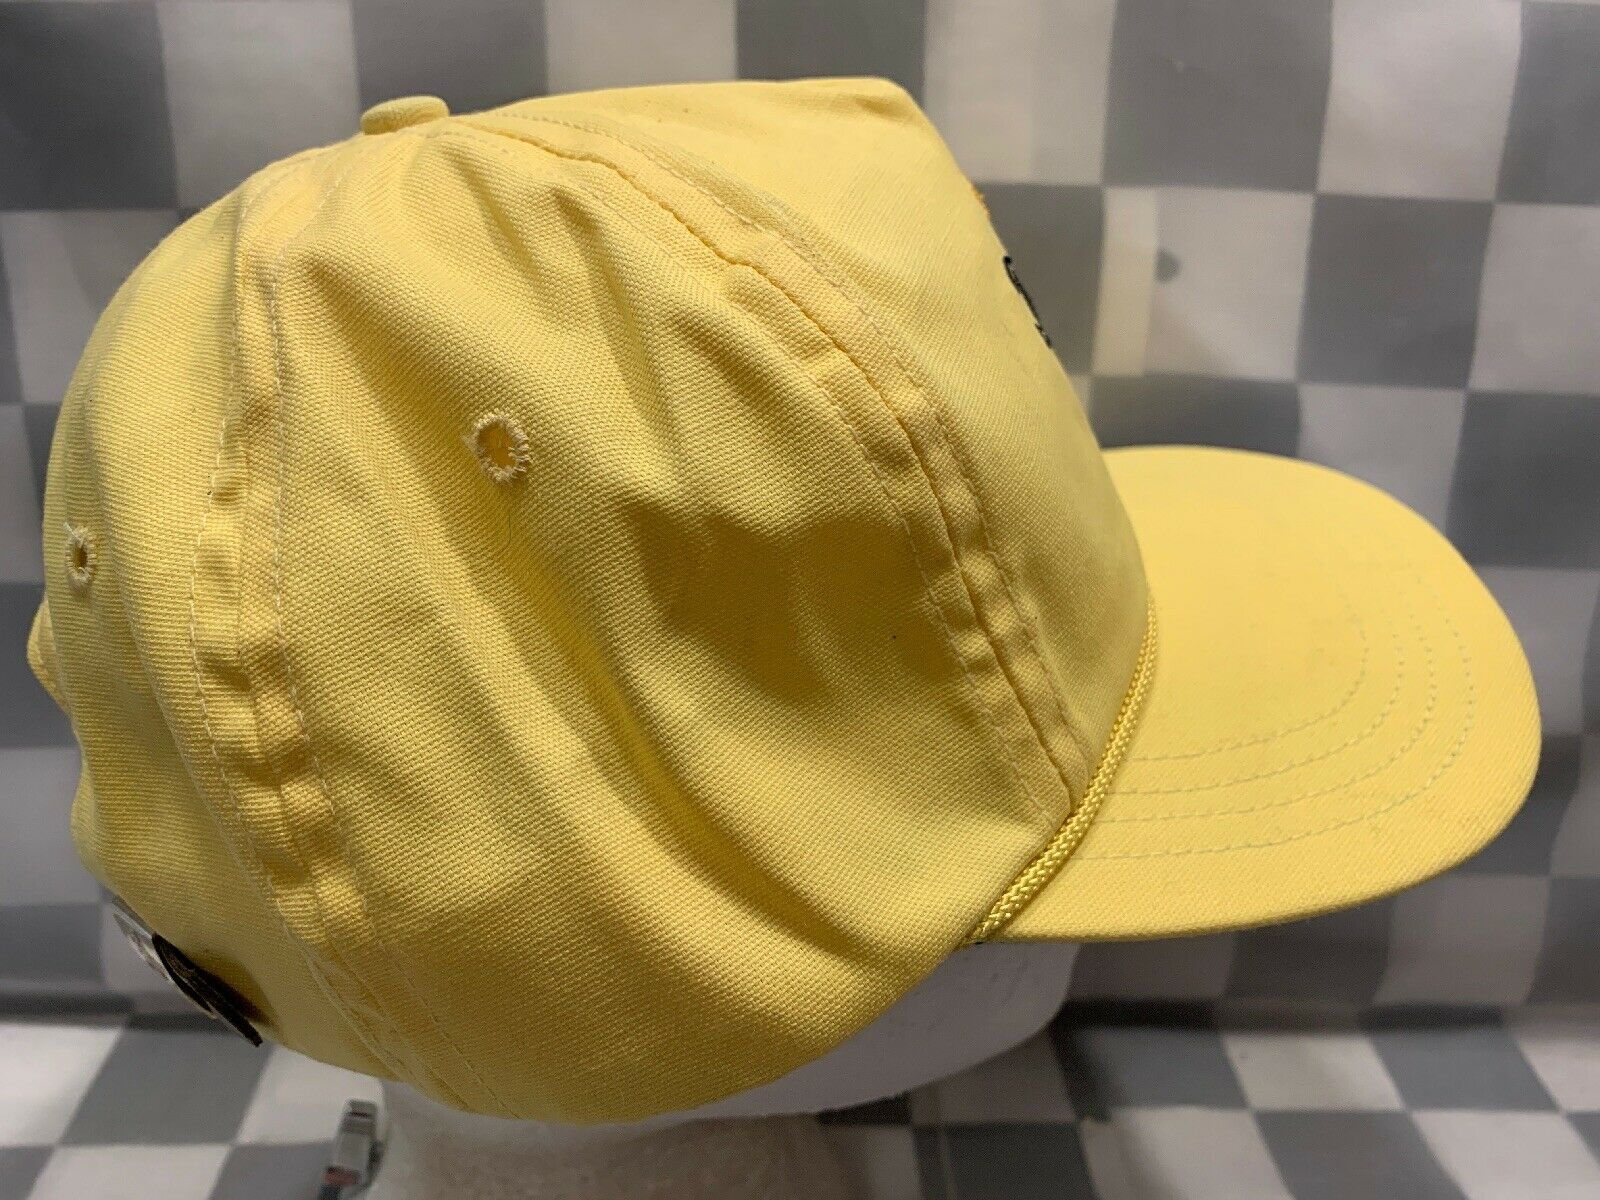 TURTLE BAY HILTON Hawaii Vinateg Made in USA Adjustable Adult Cap Hat image 4